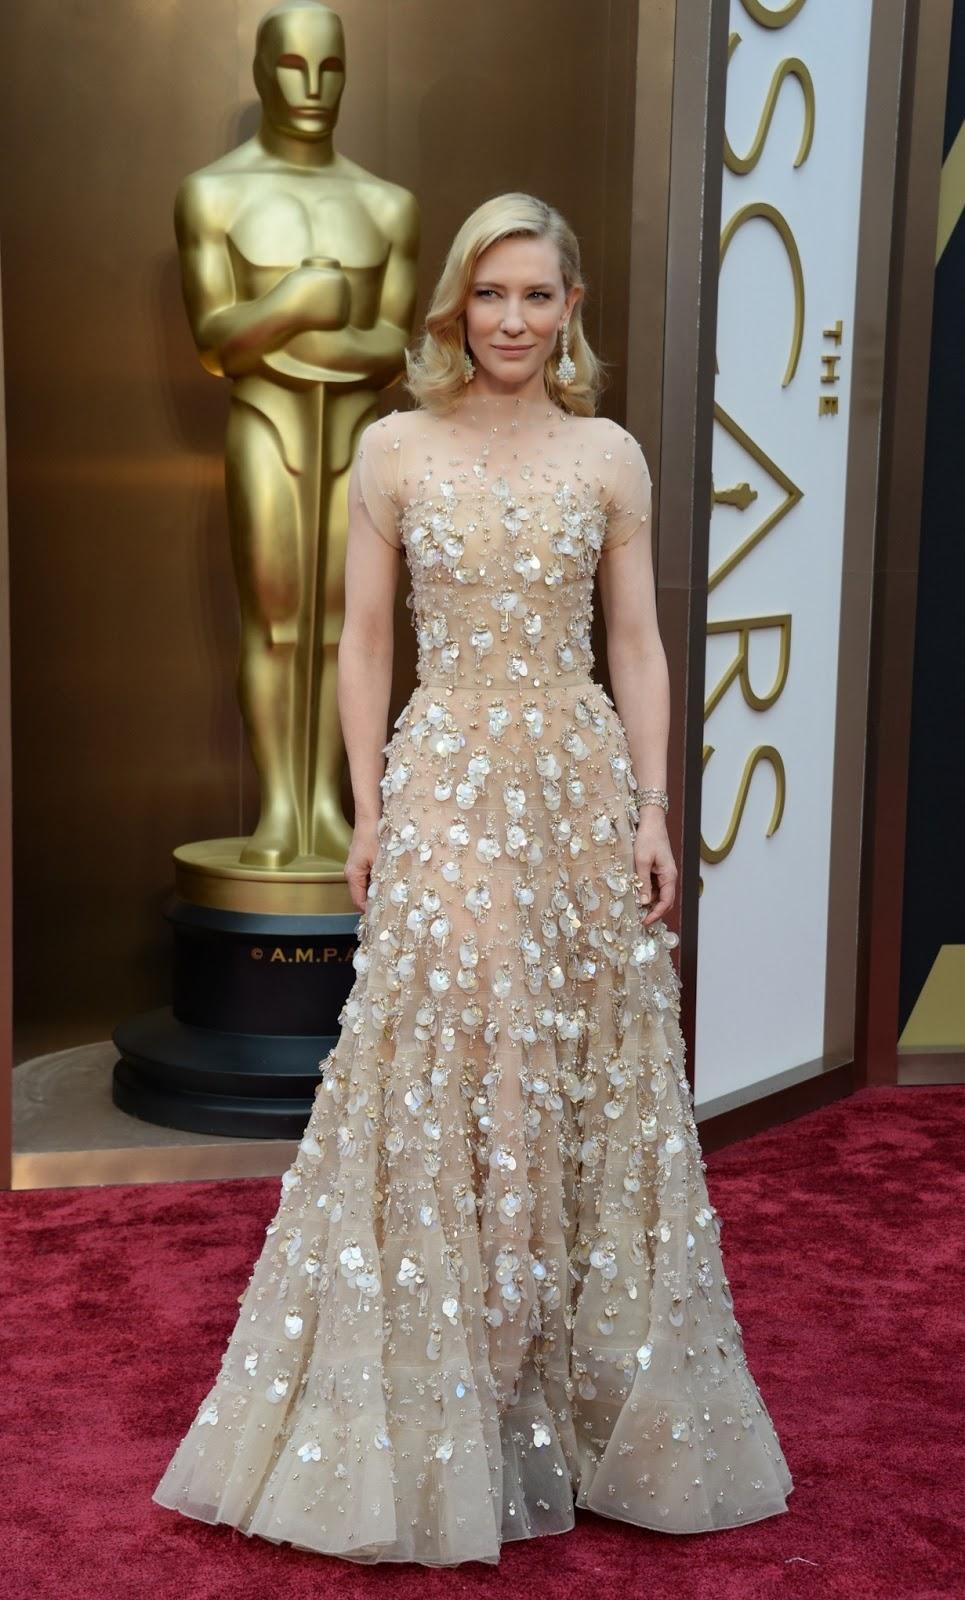 Turning Oscar Fashion Into Home Fashion